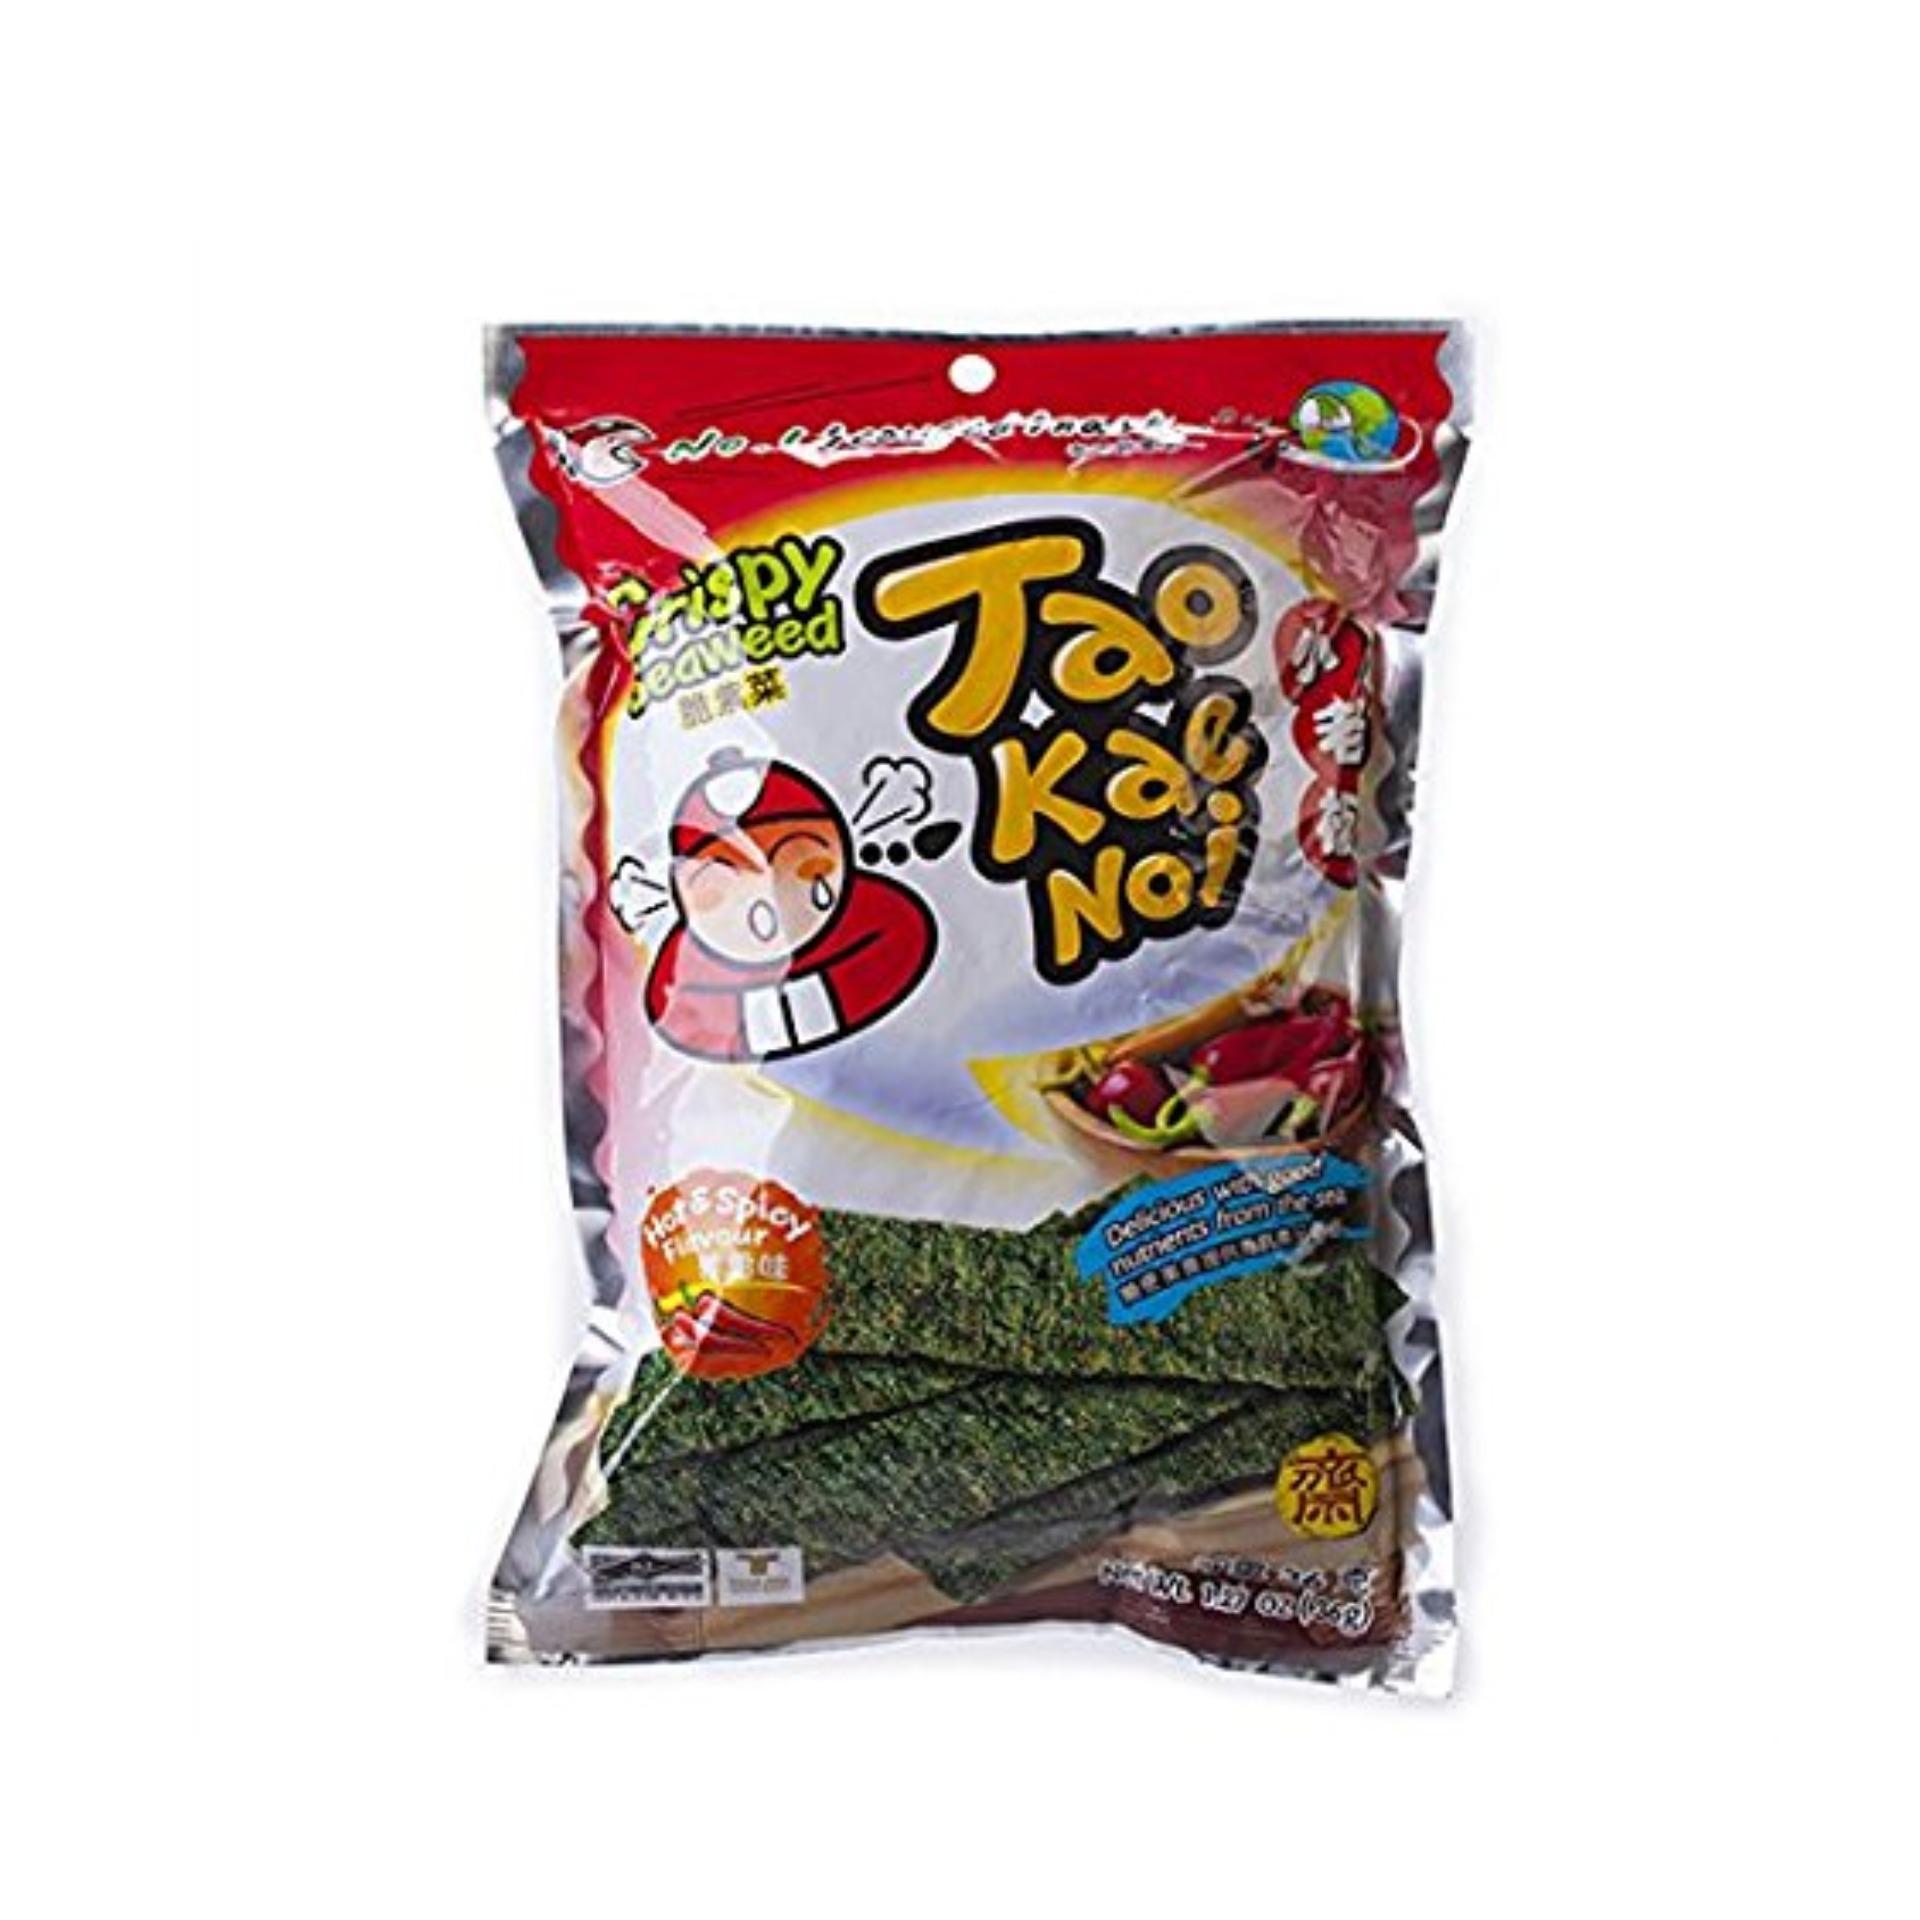 Snack Rong biển Taokaenoi Sấy Crispy Seaweed vị Cay 15g